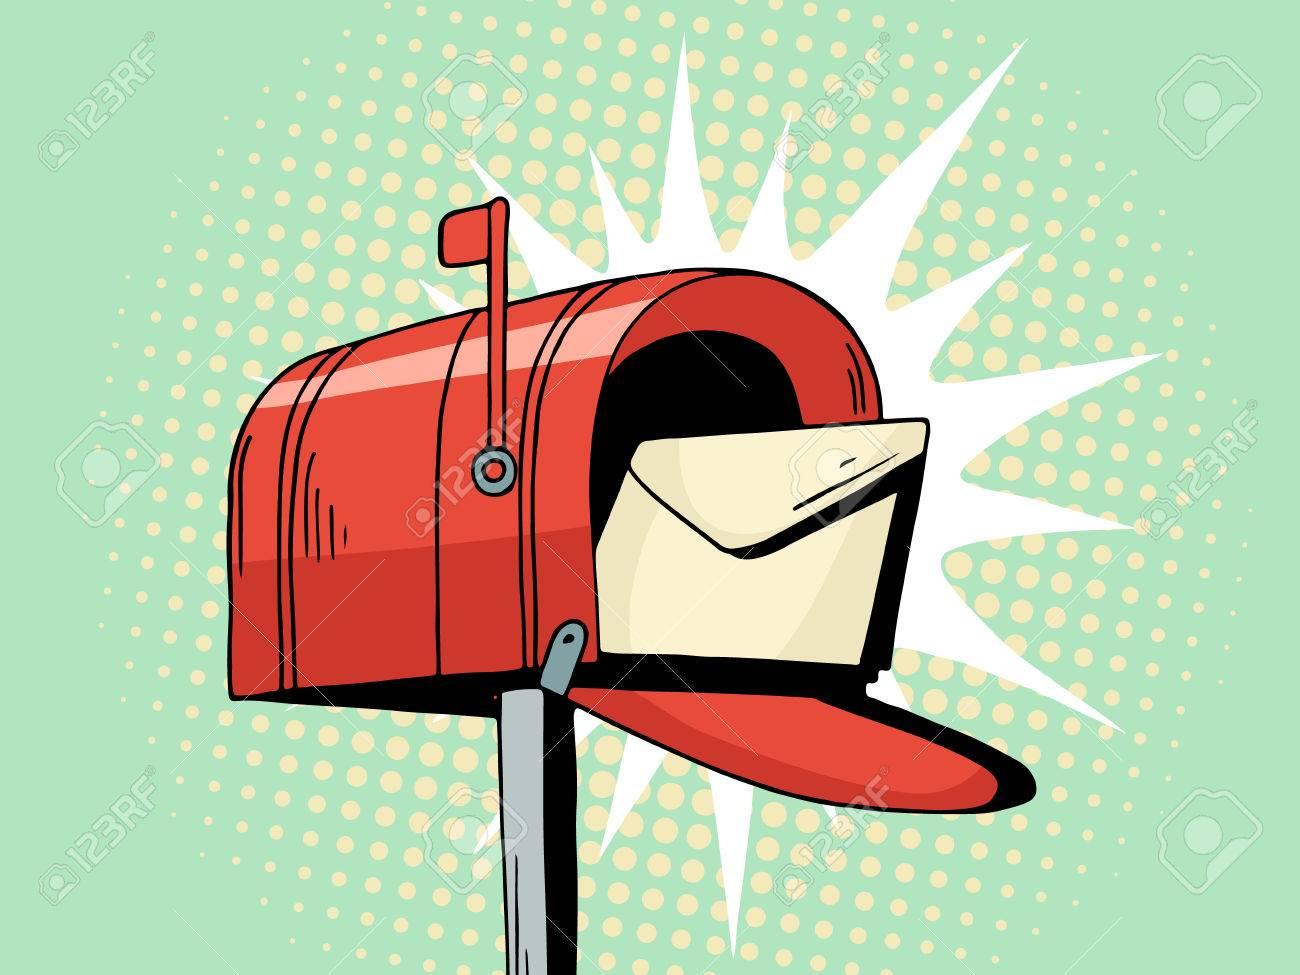 Cartoon Pop Art Red Mailbox Send Letter Comic Hand Drawn